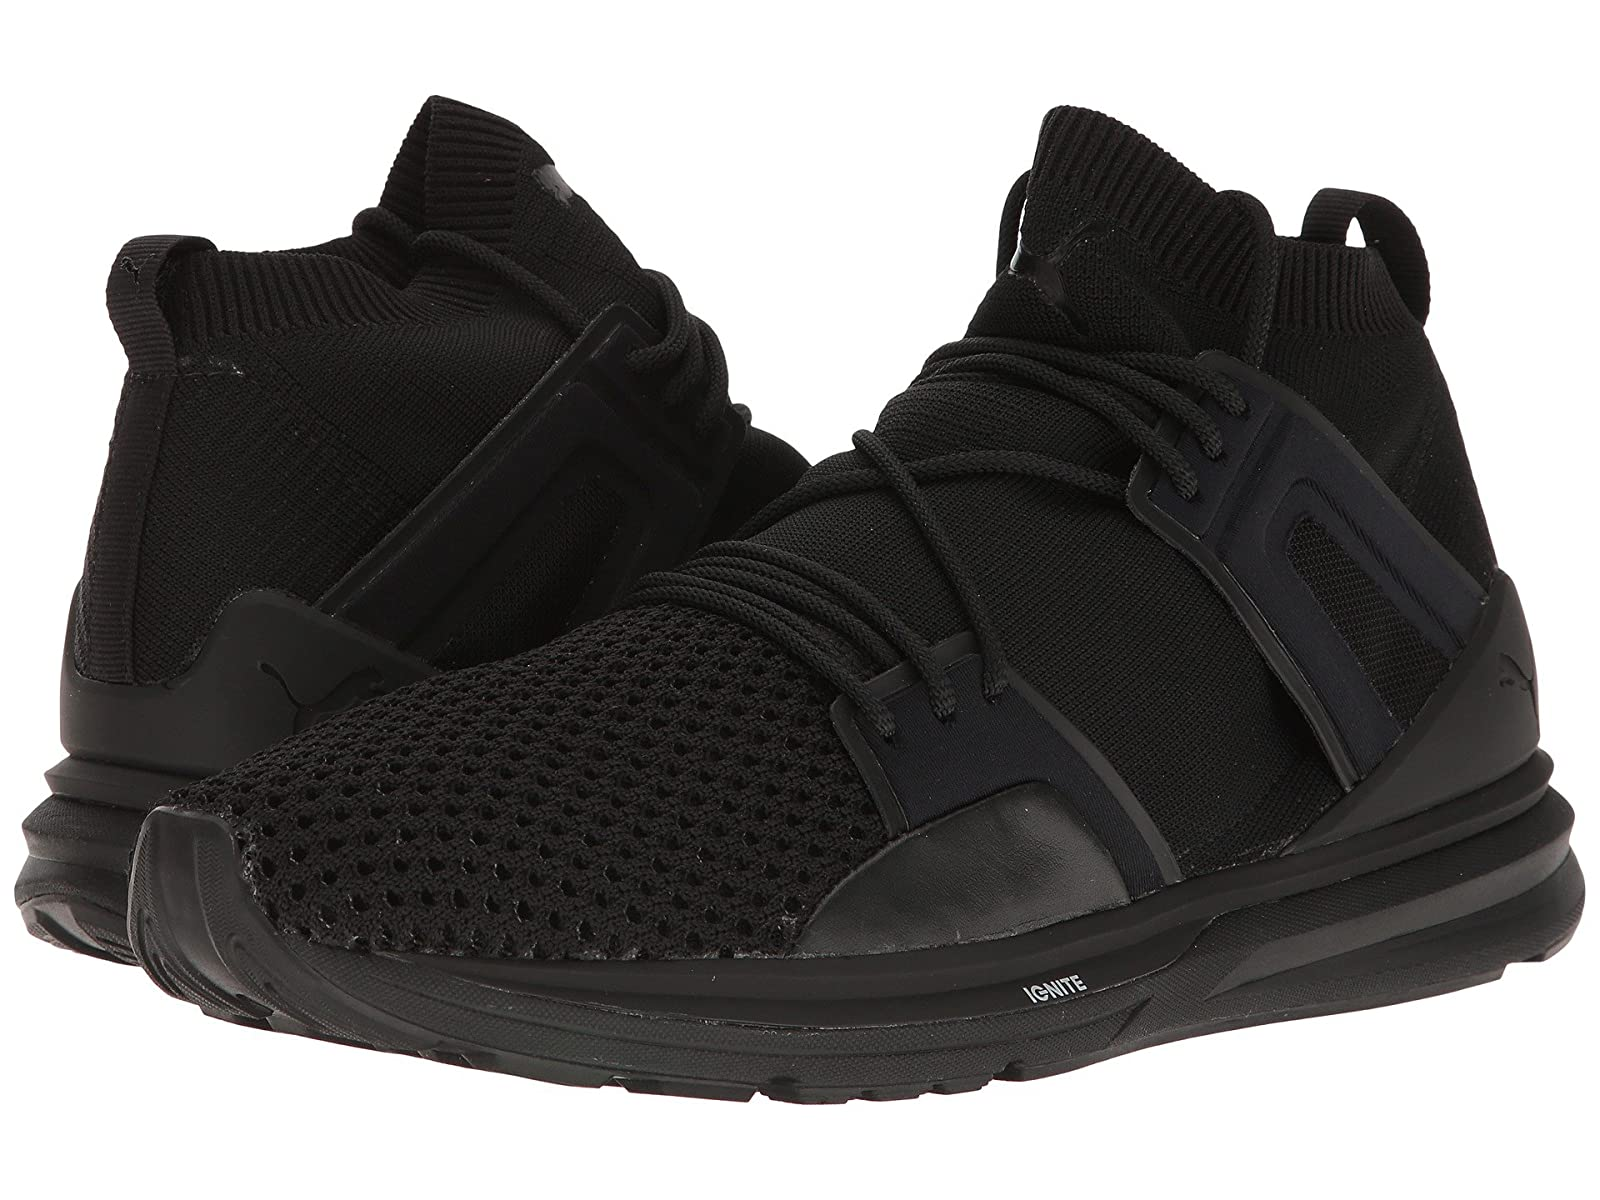 PUMA B.O.G Limitless Hi EvoknitCheap and distinctive eye-catching shoes